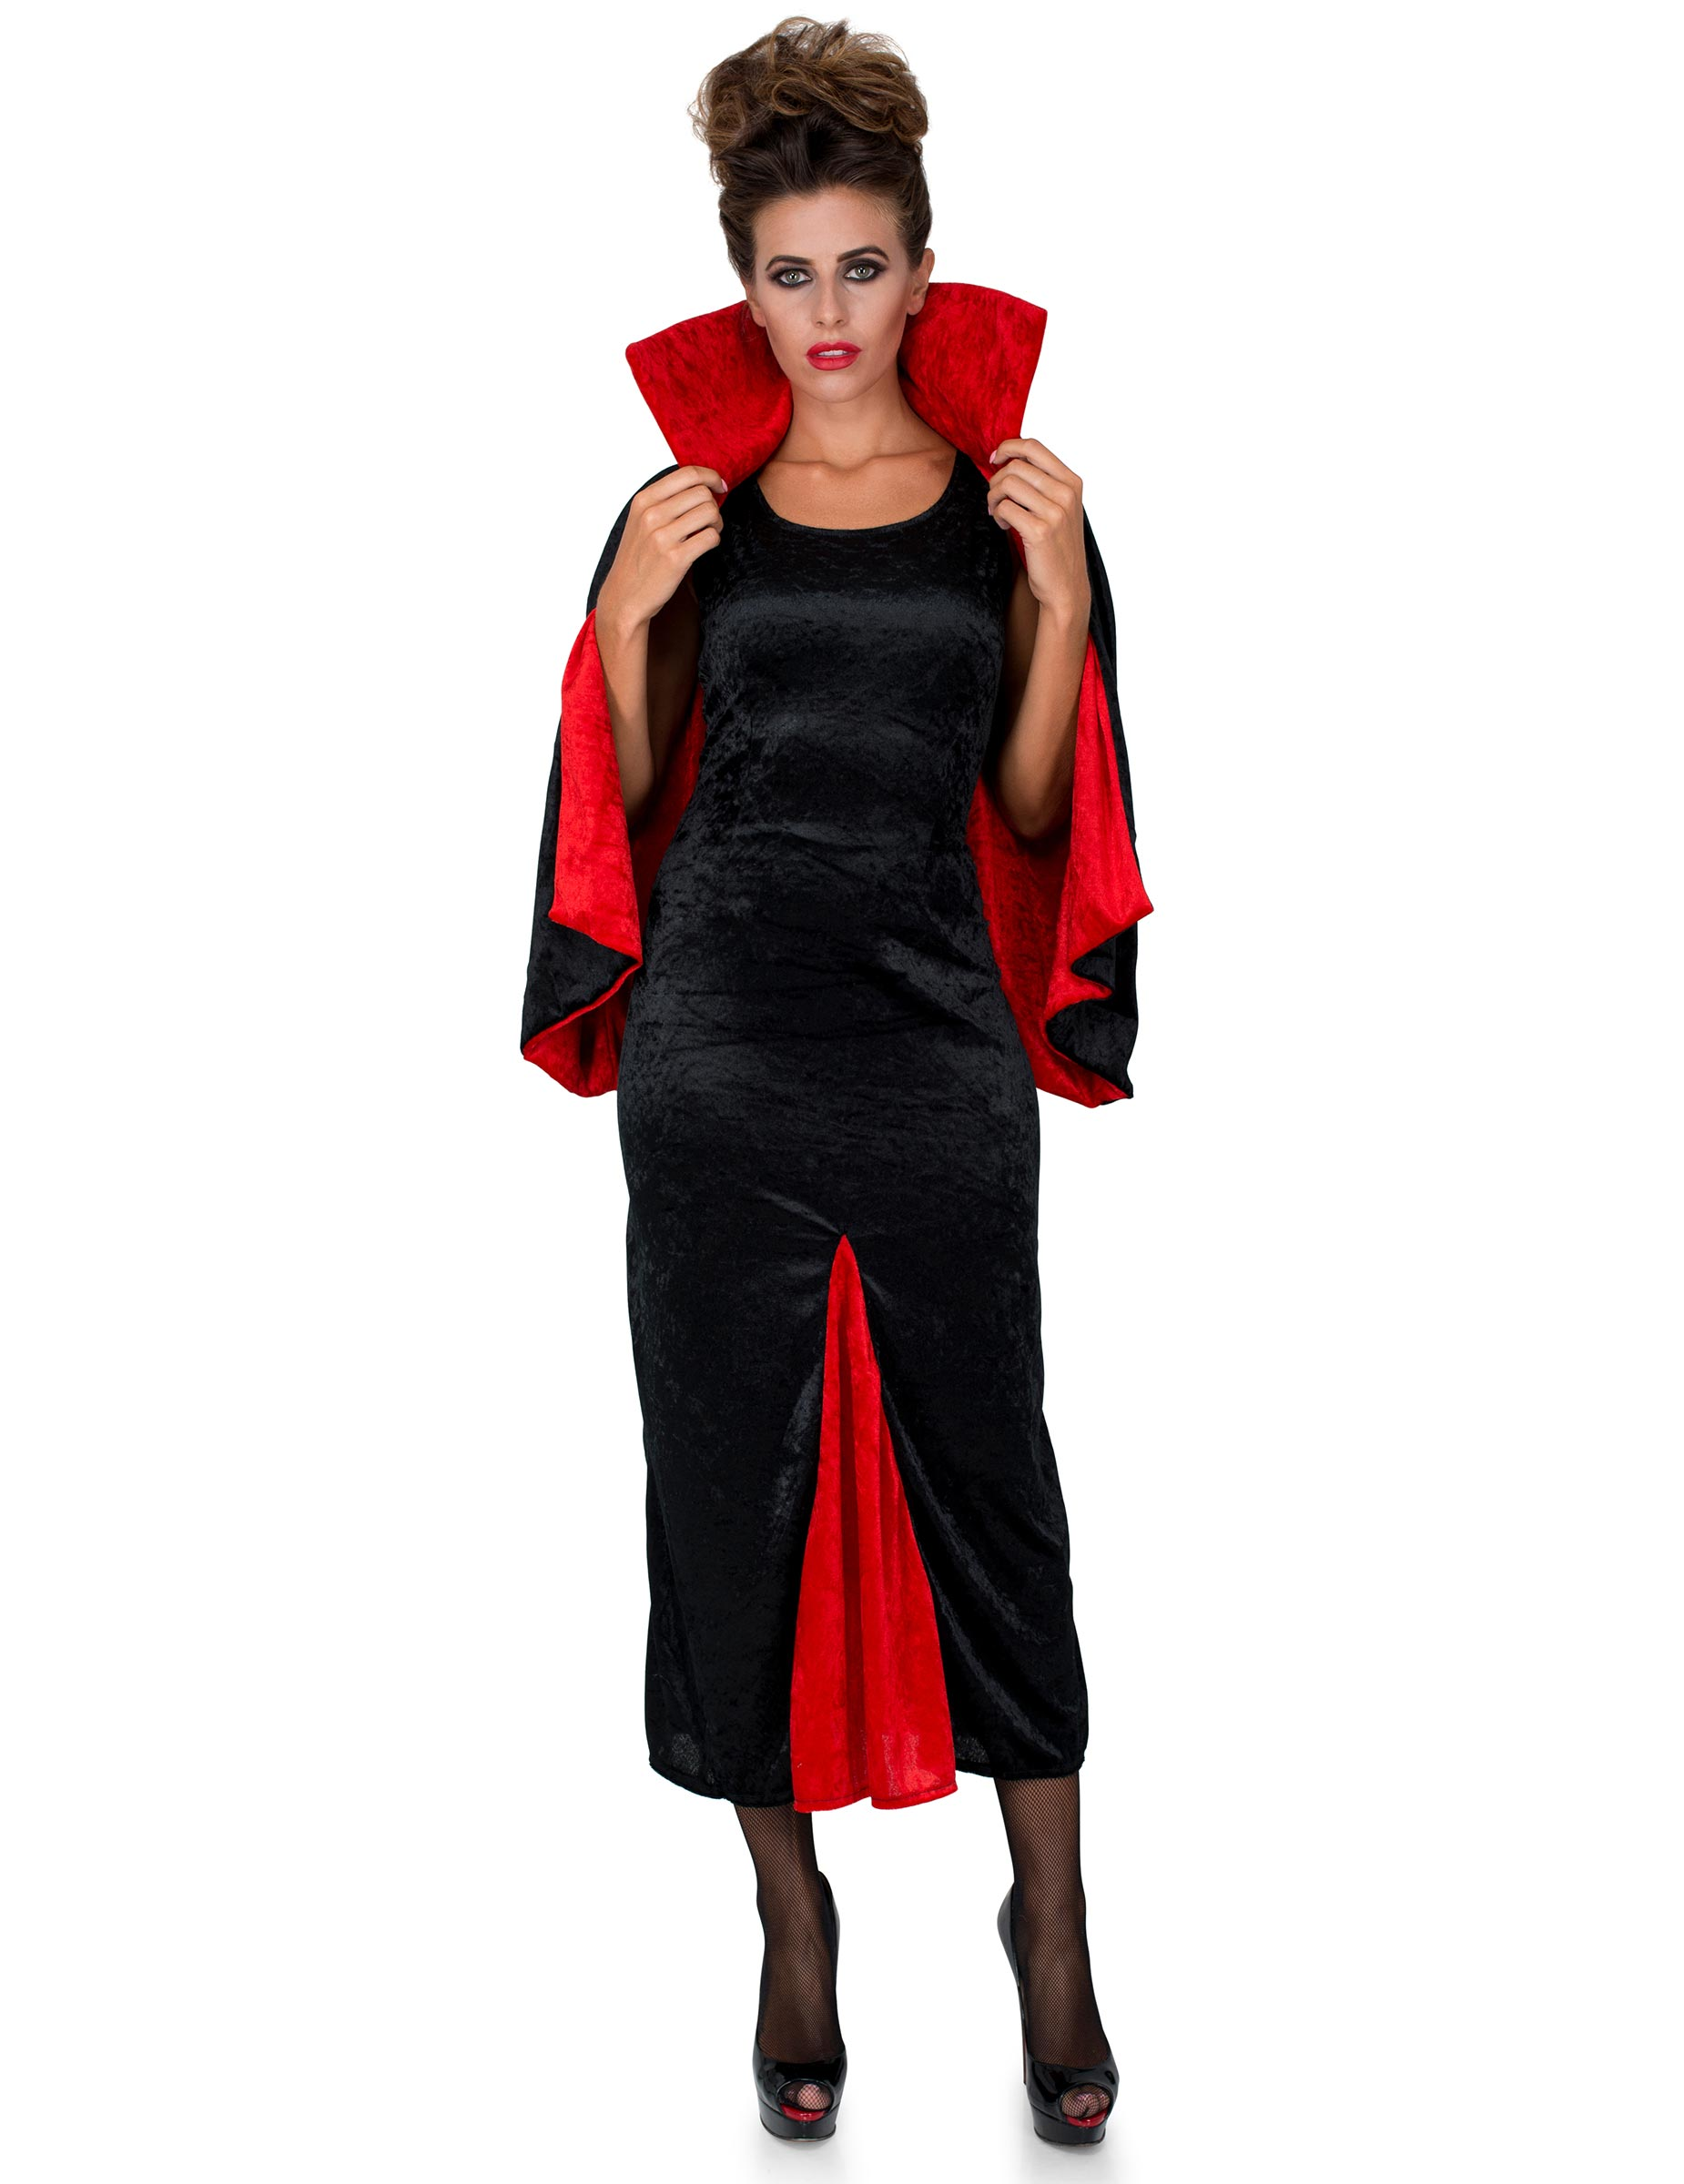 Image Result For Costume Pour Halloween Deguisement Vampire Fille Halloween Deguise Toi Achat